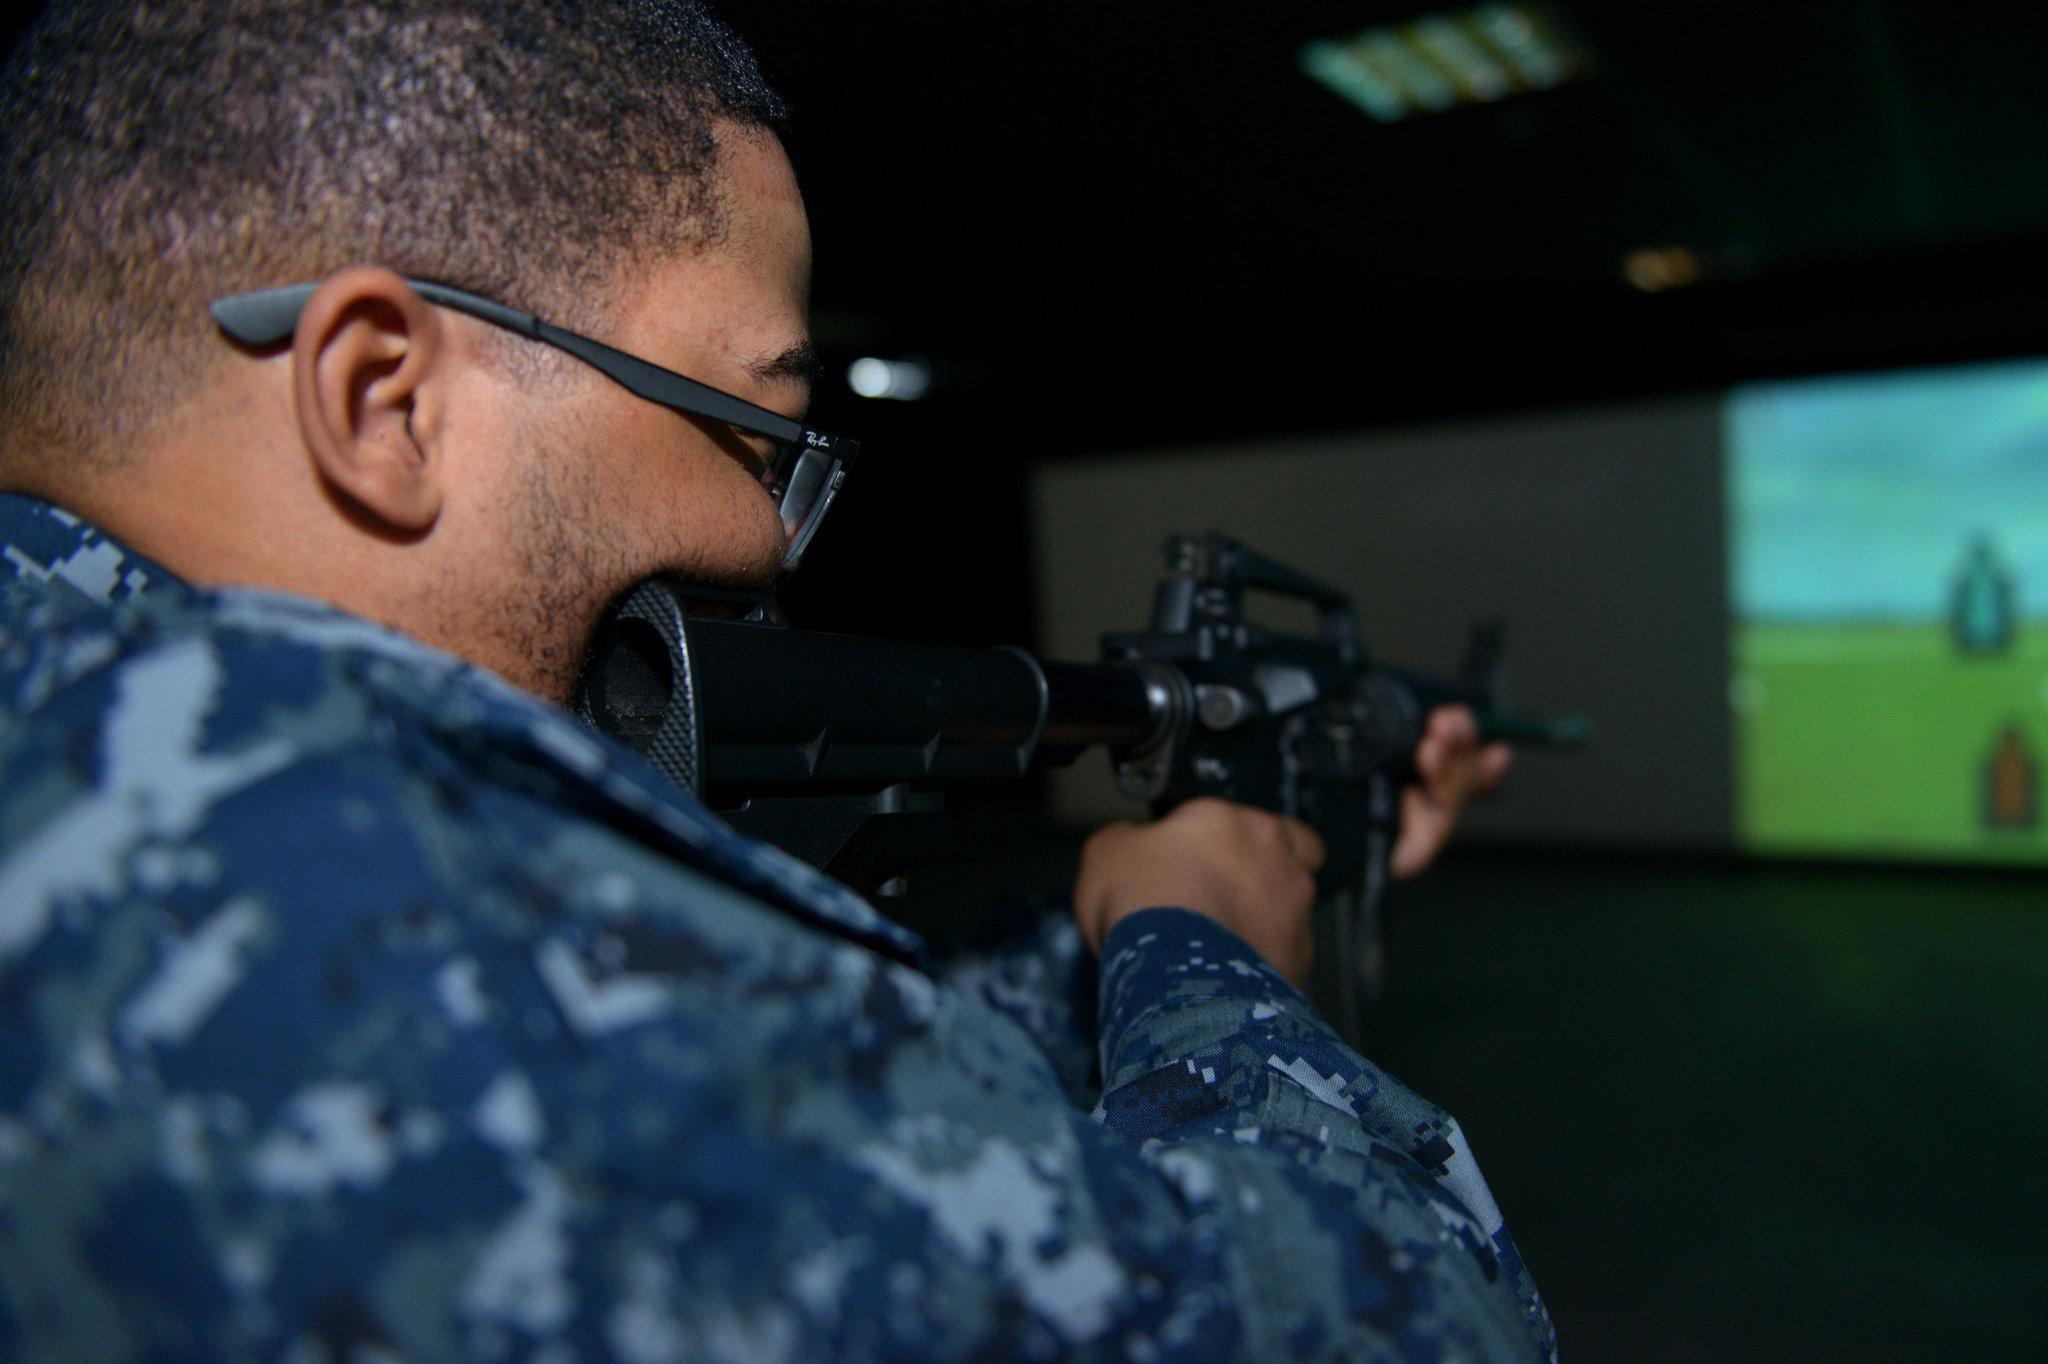 Un marin américain